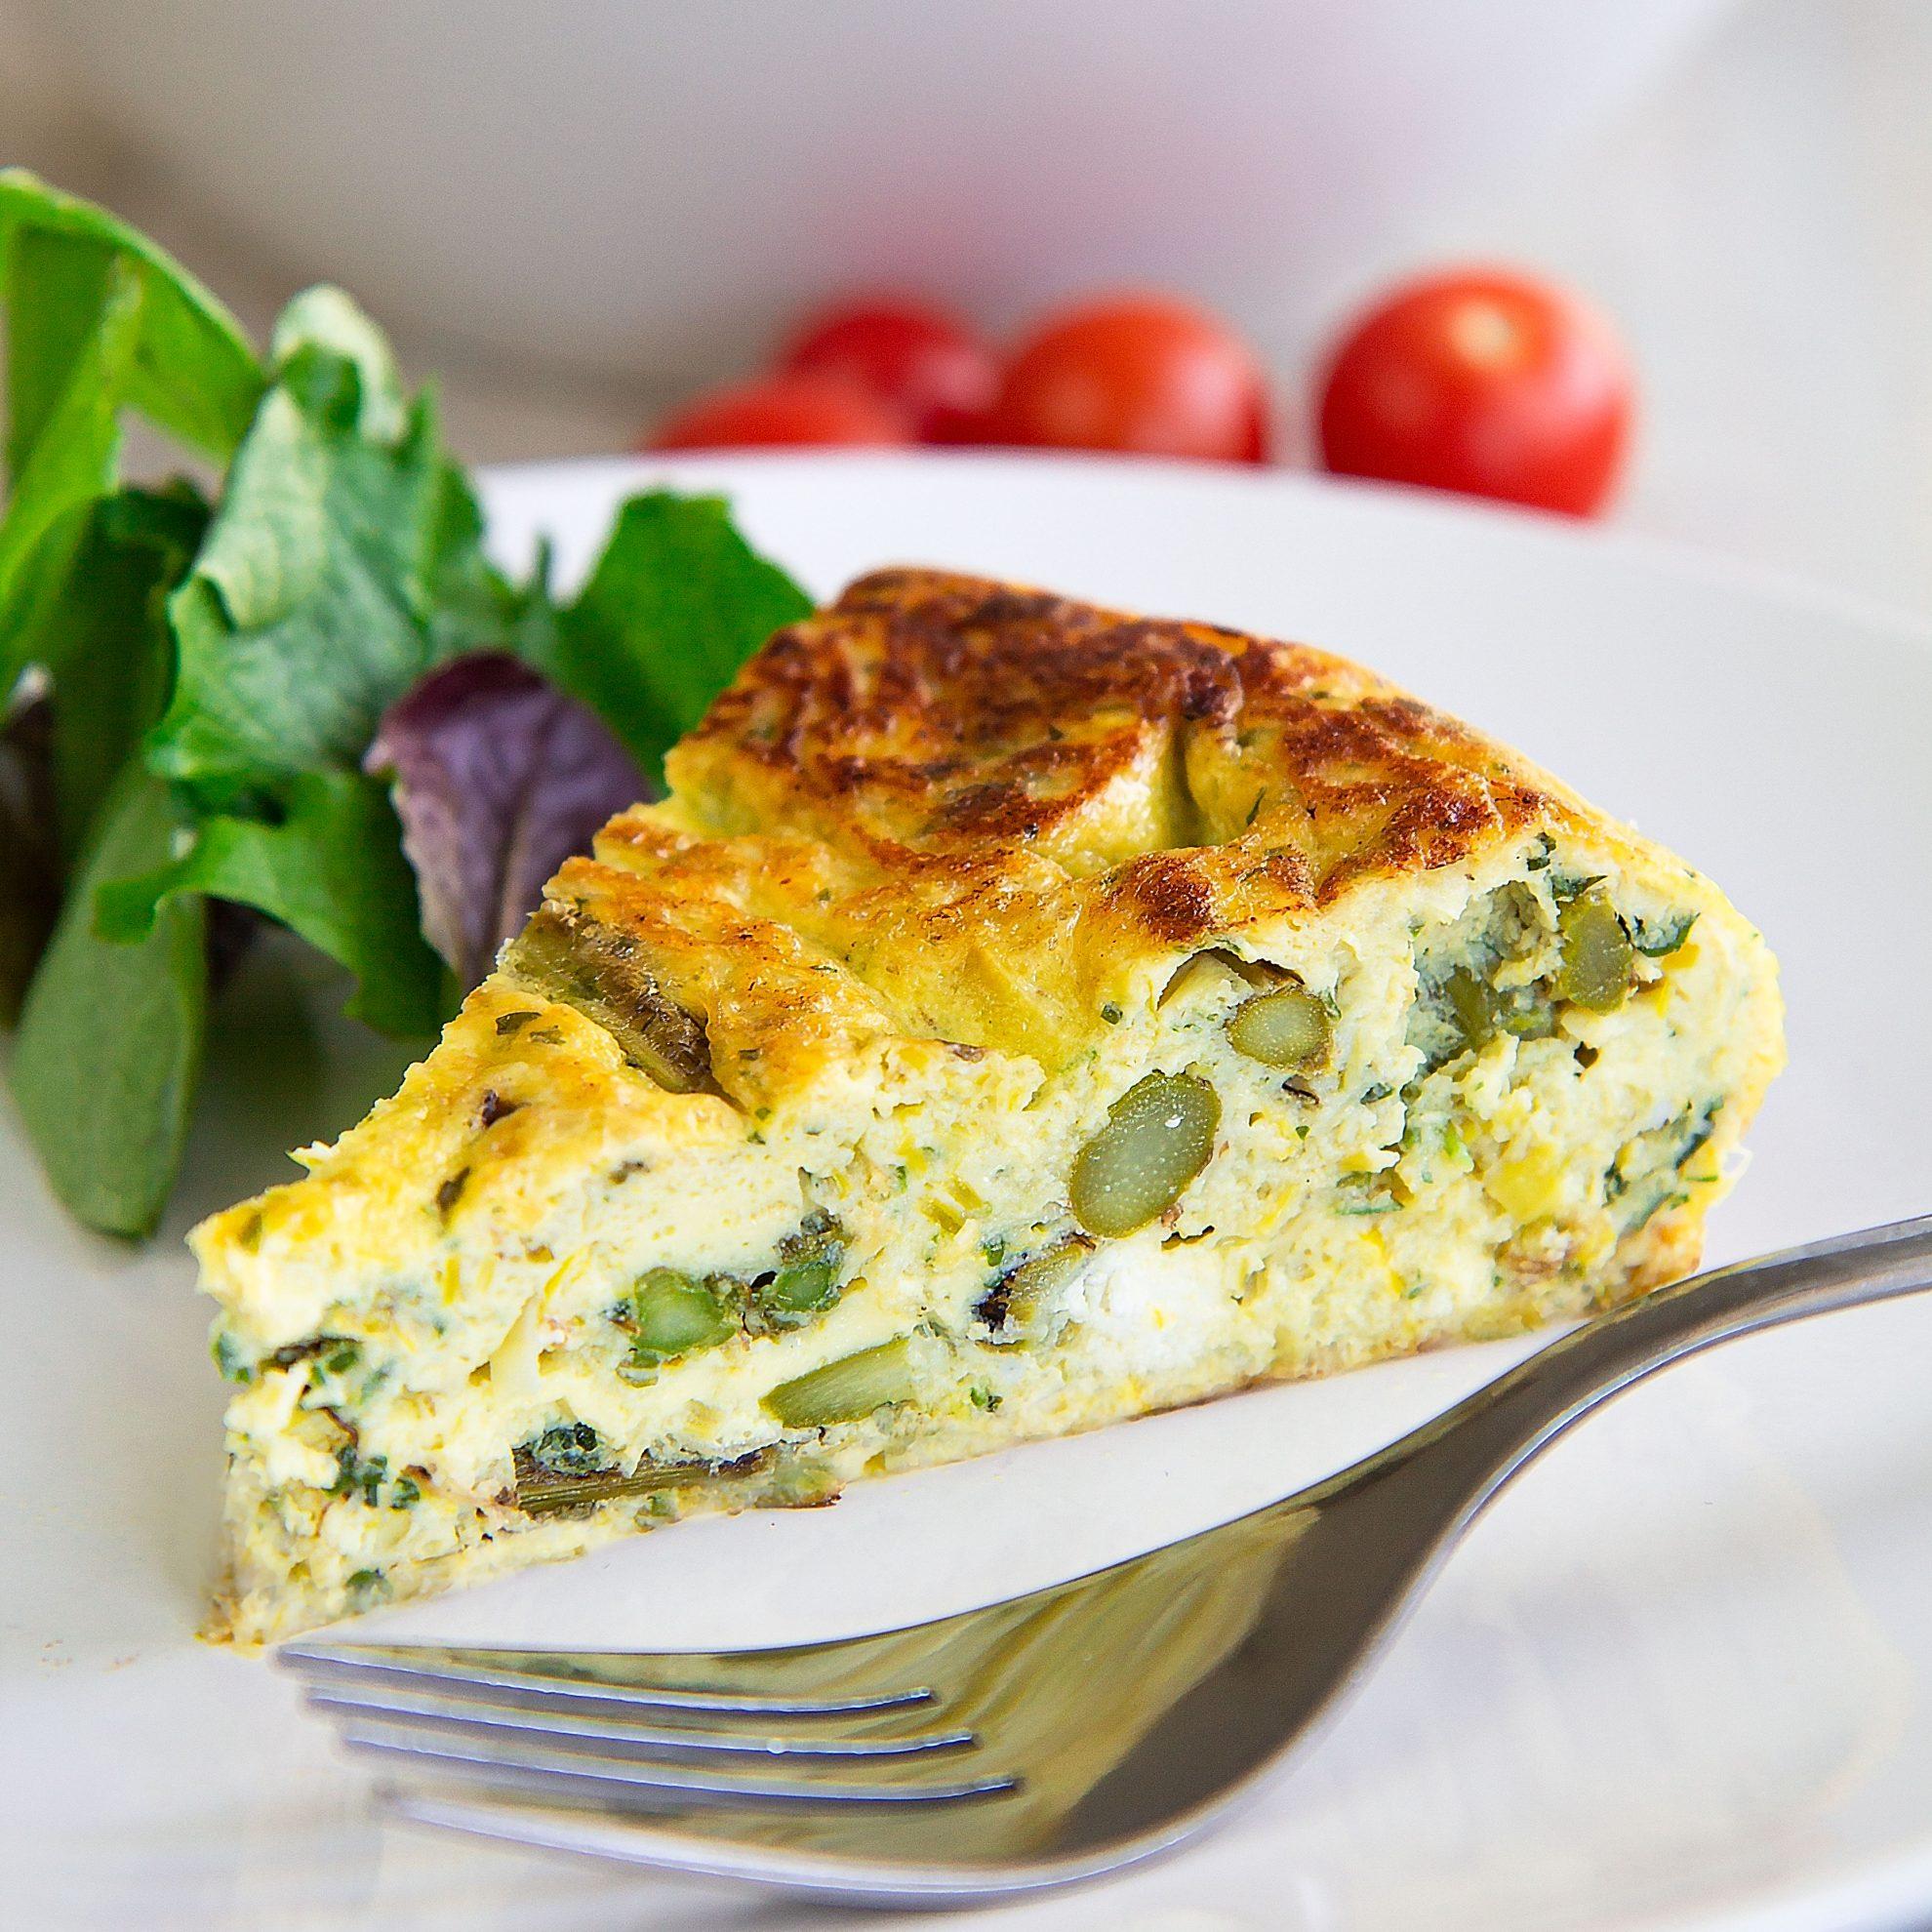 ASPARAGUS FRITTATA with goat cheese - Italian recipe